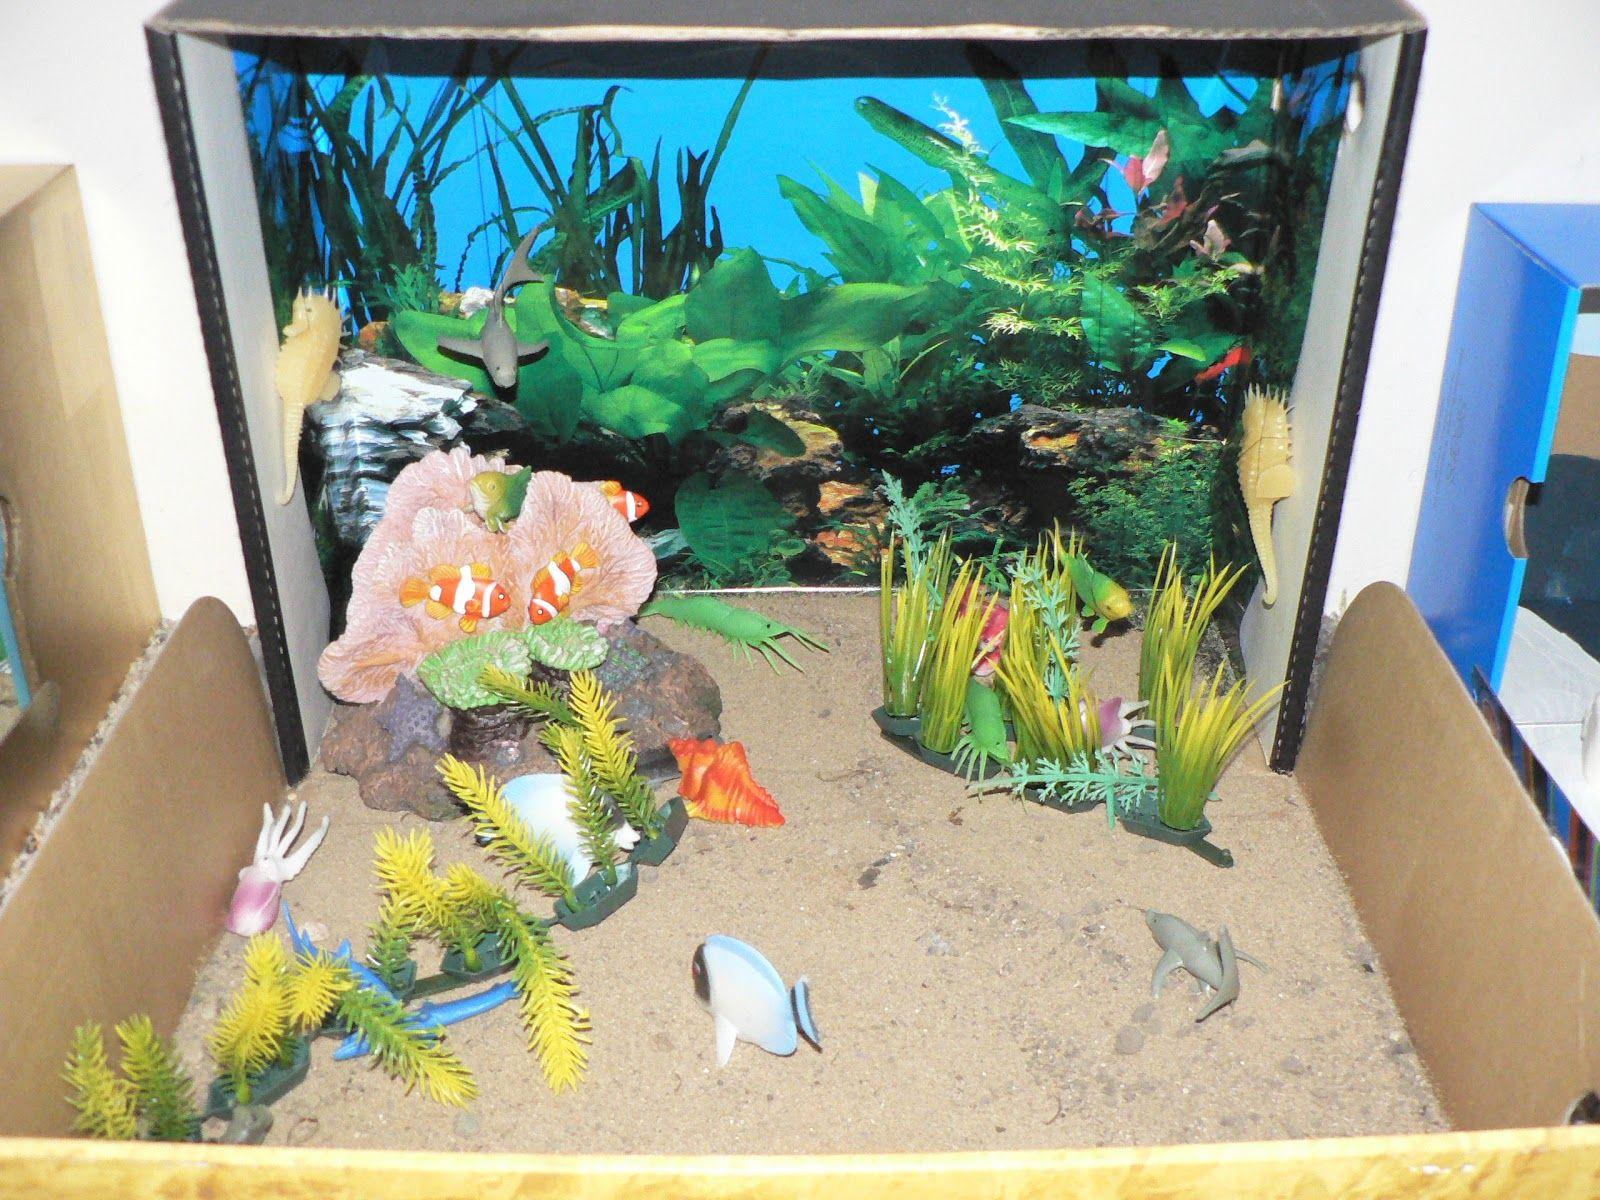 top ocean habitat diorama - photo #17